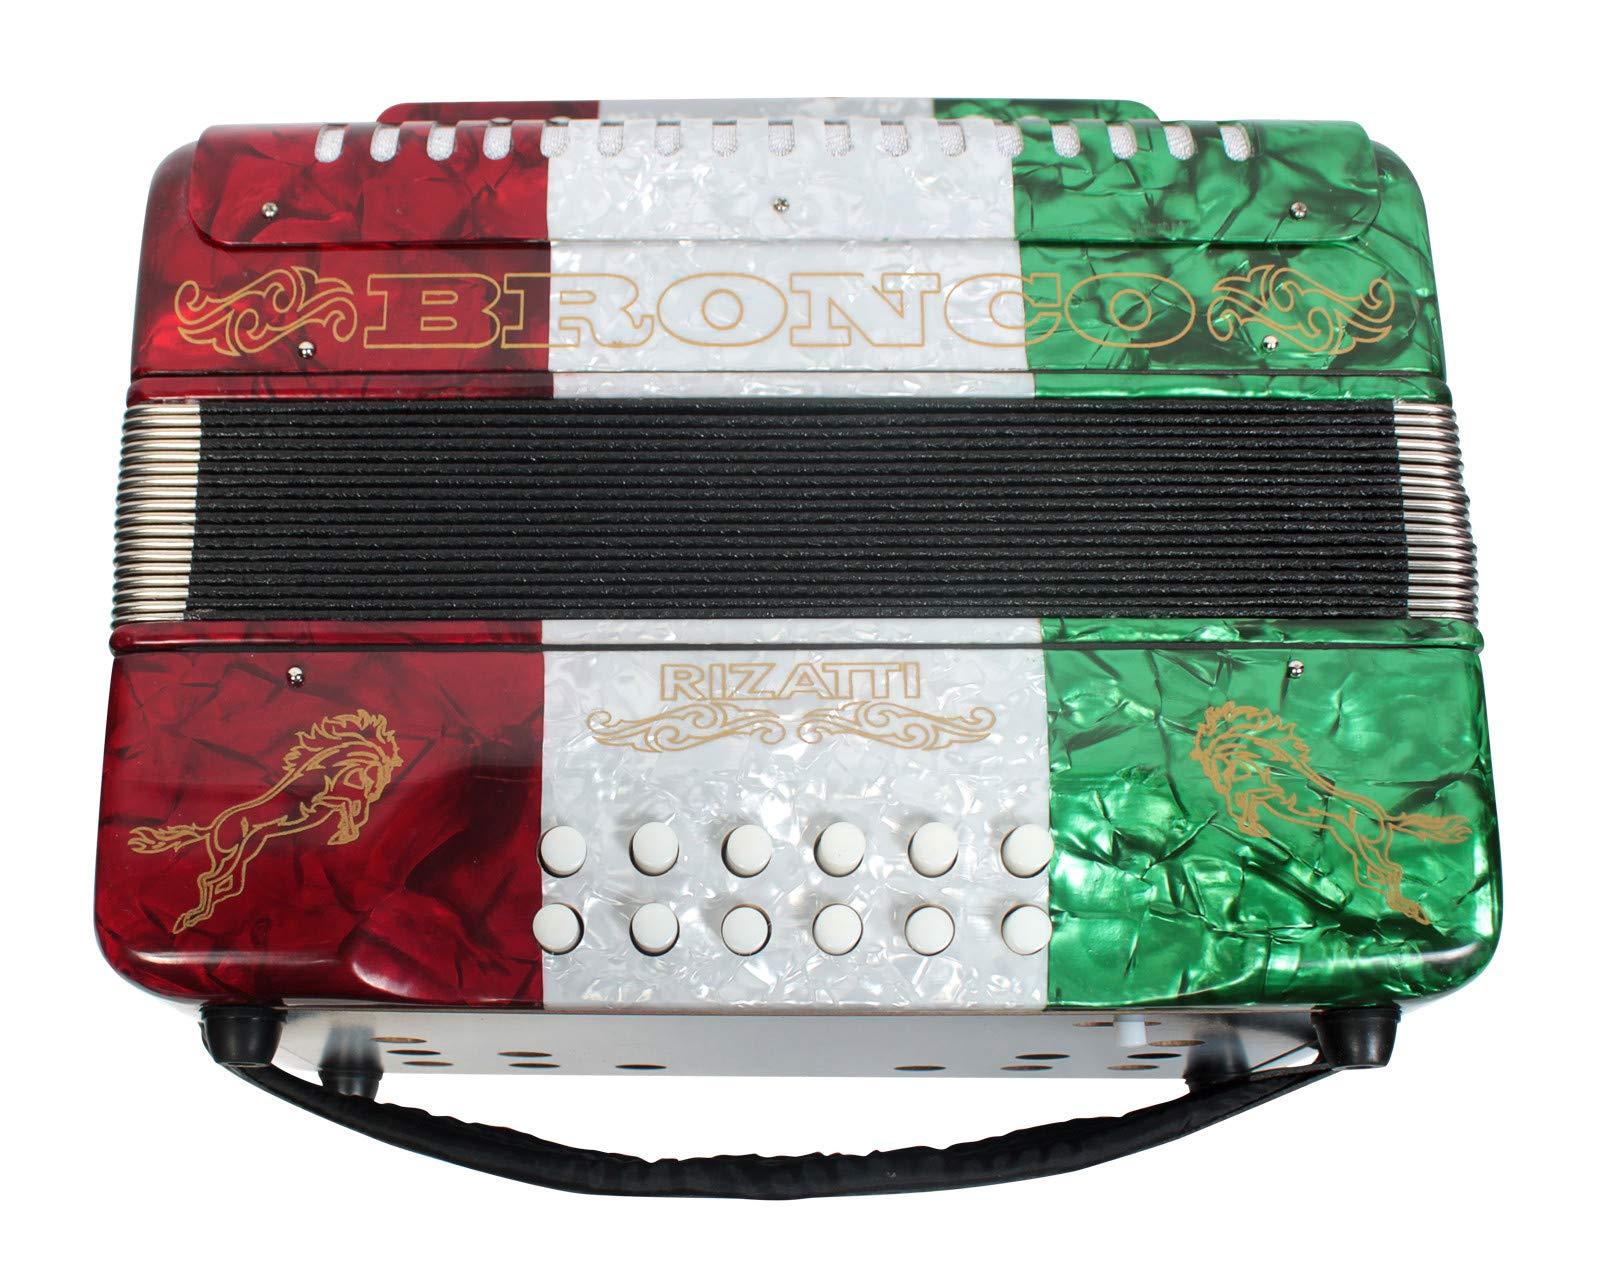 Rizatti Bronco RB31GM Diatonic Accordion - Mexican Flag - Key G/C/F by RIZATTI (Image #3)